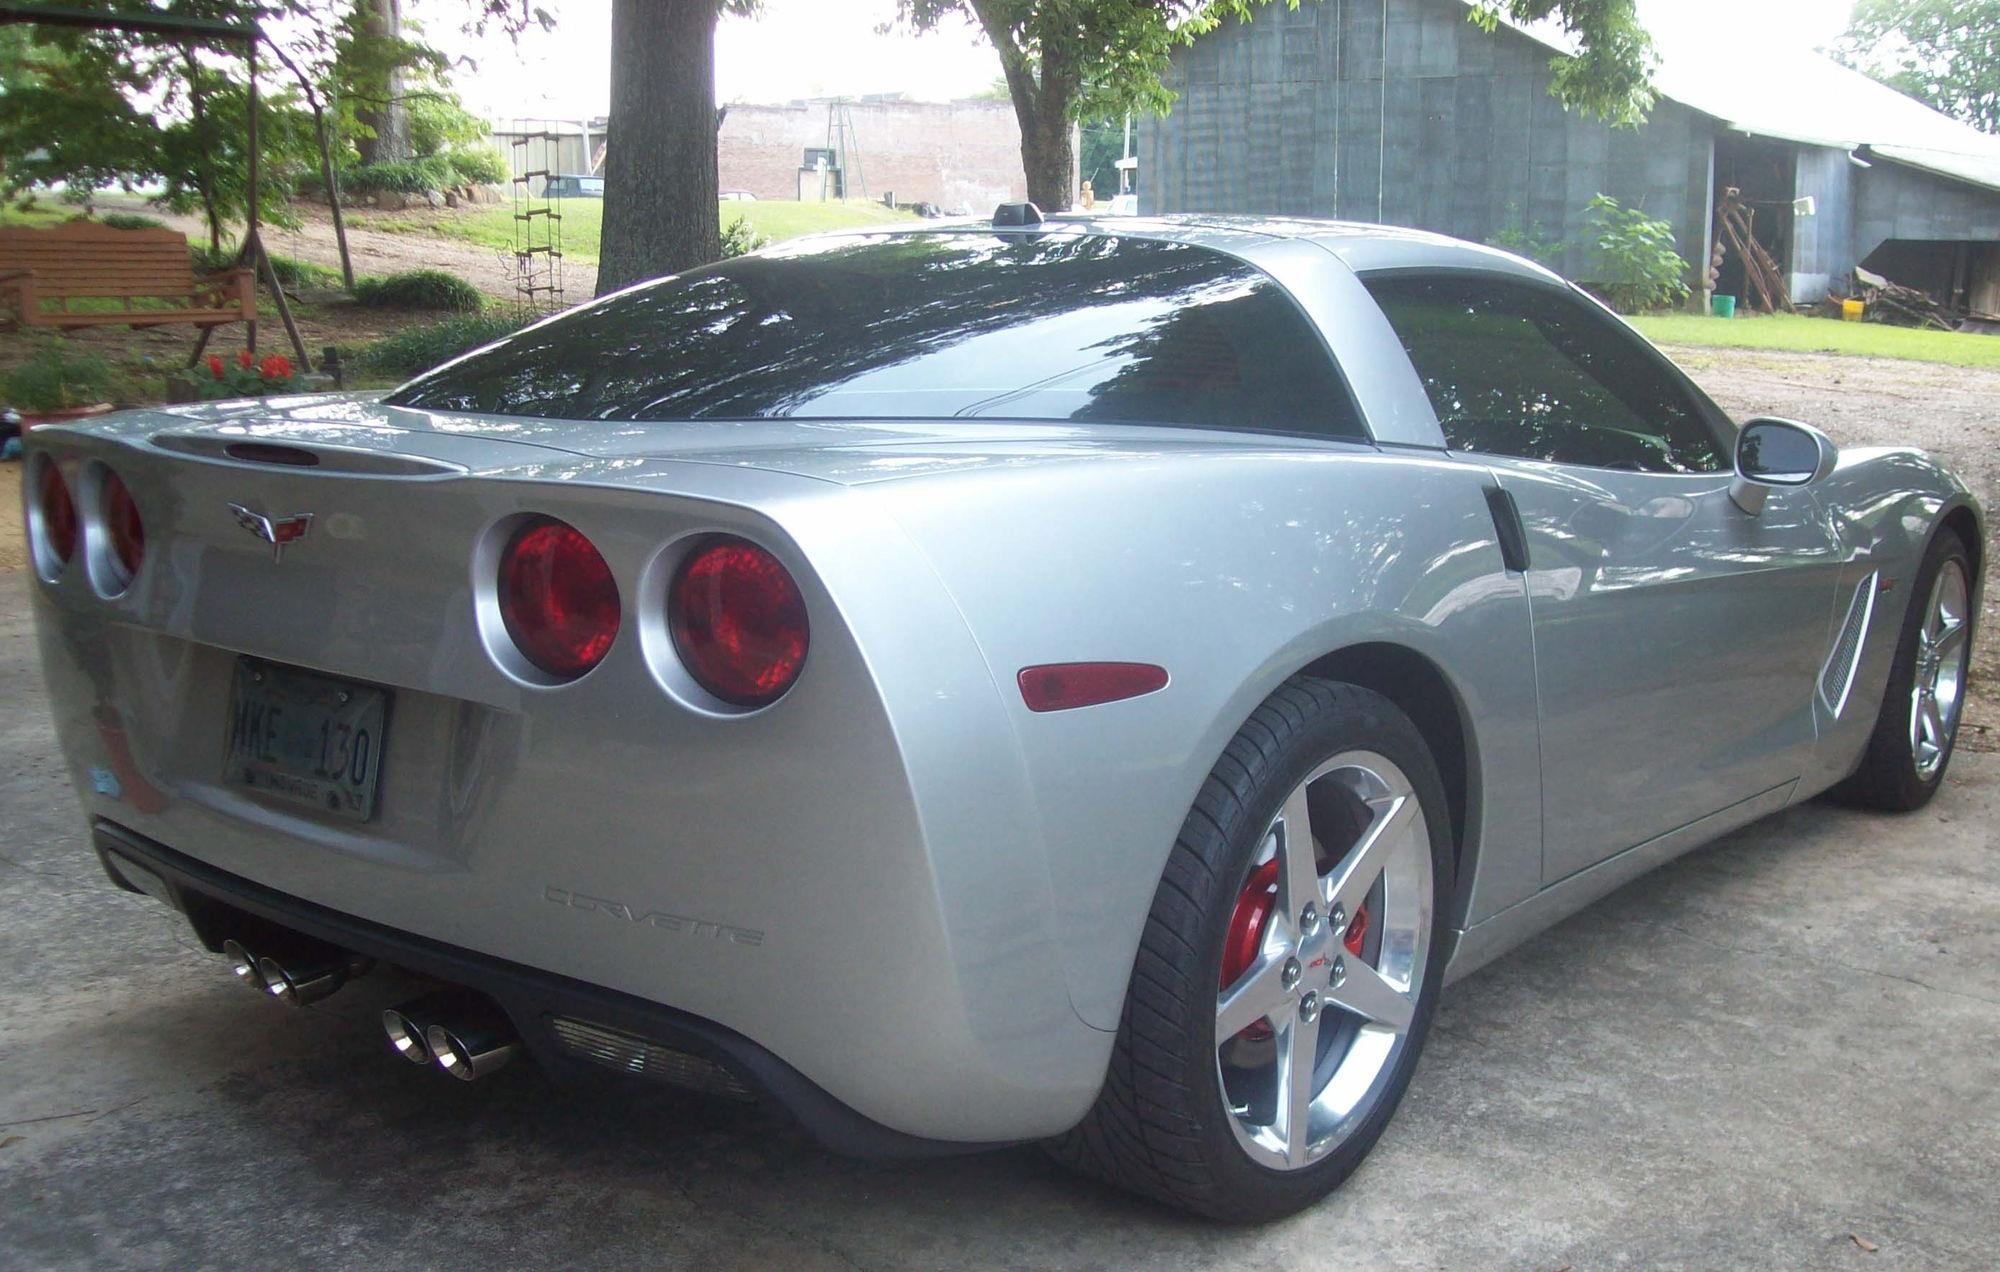 fs for sale 2005 base coupe 22 000 north ms corvetteforum chevrolet corvette forum discussion. Black Bedroom Furniture Sets. Home Design Ideas